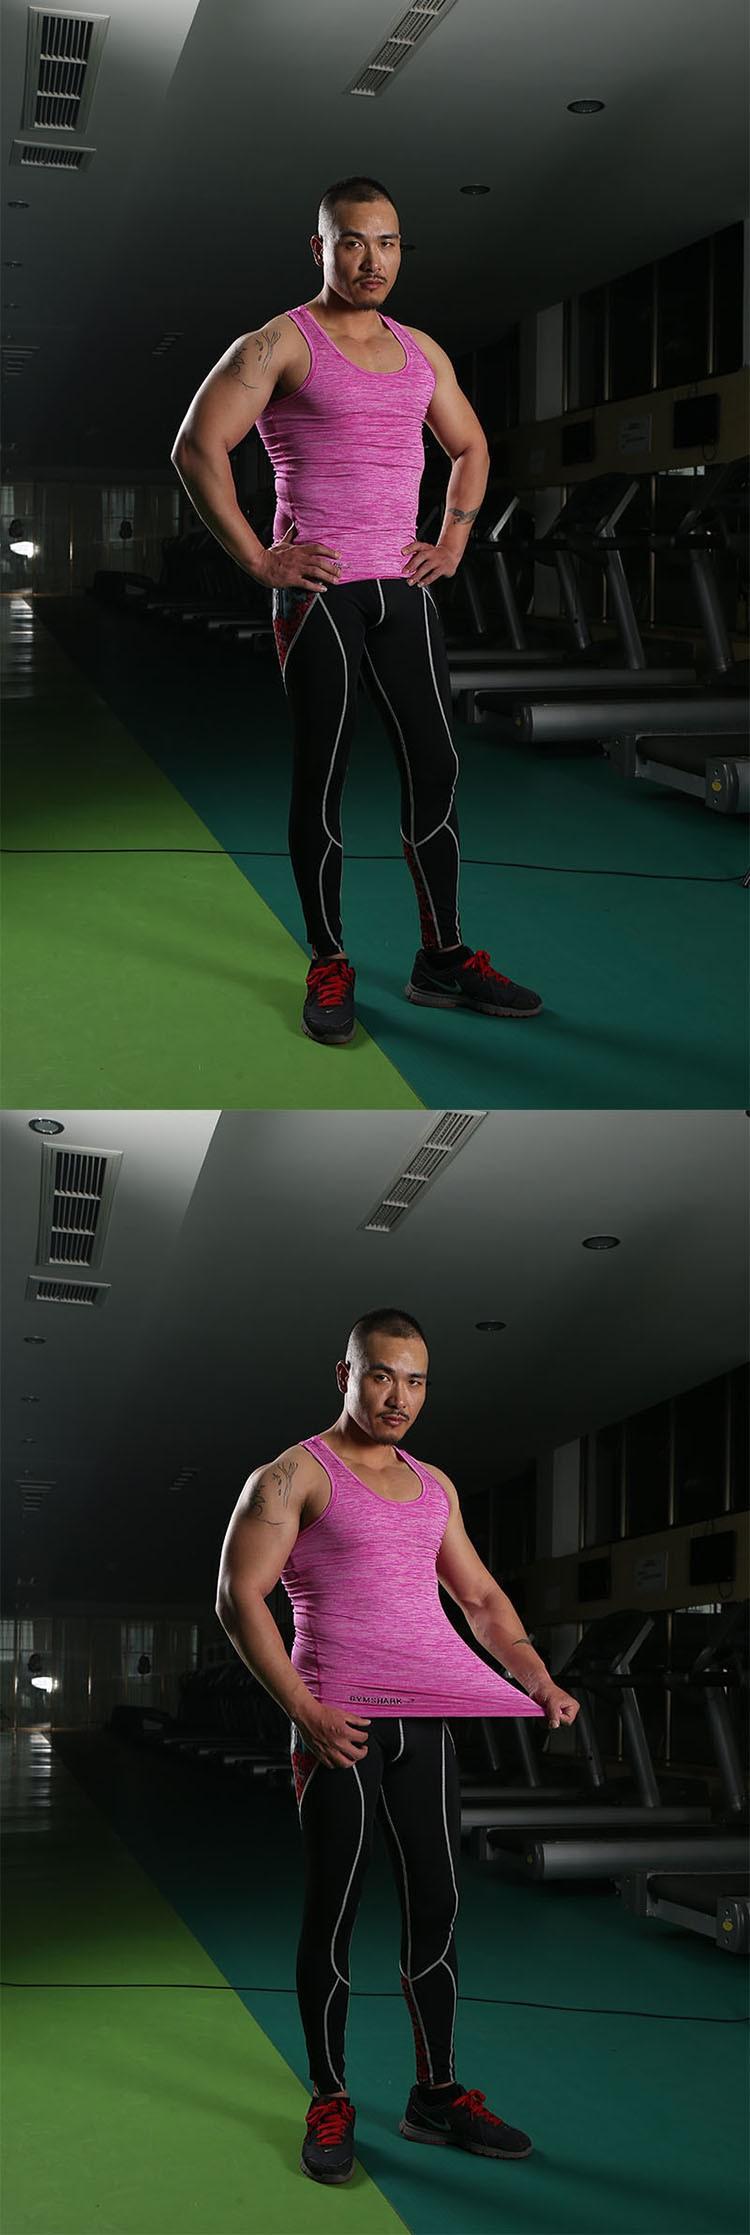 Gym Tank Tops Men Undershirt Sports Wear GymShark Singlet Bodybuilding Basketball Fitness Training Tight Vest Sleeveless Shirt (4)